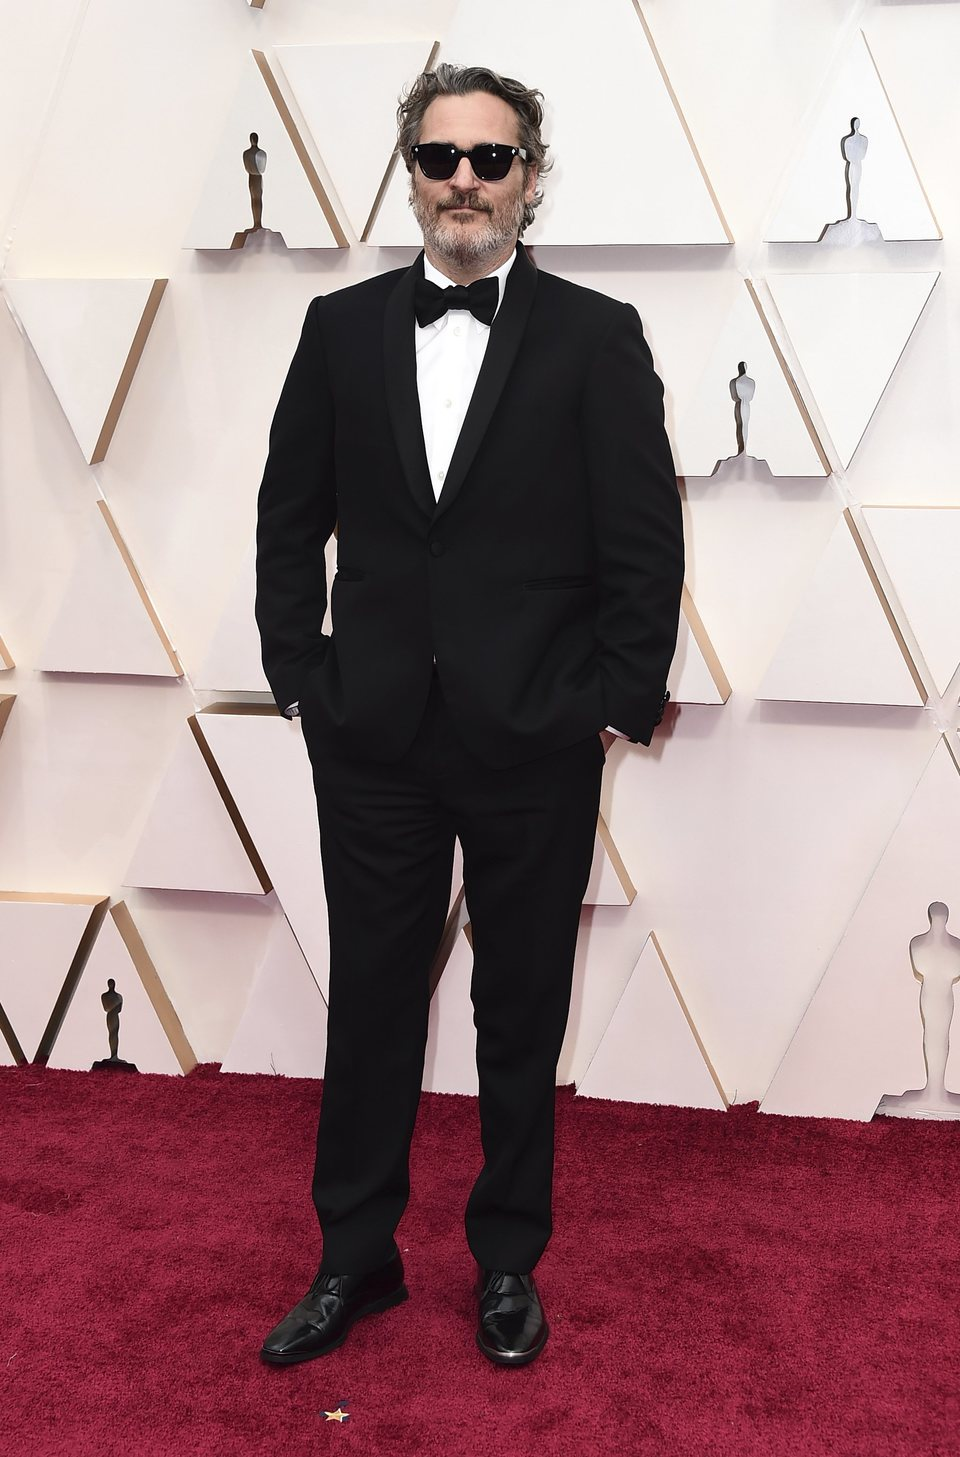 Joaquin Phoenix on the red carpet at the 2020 Oscar Awards